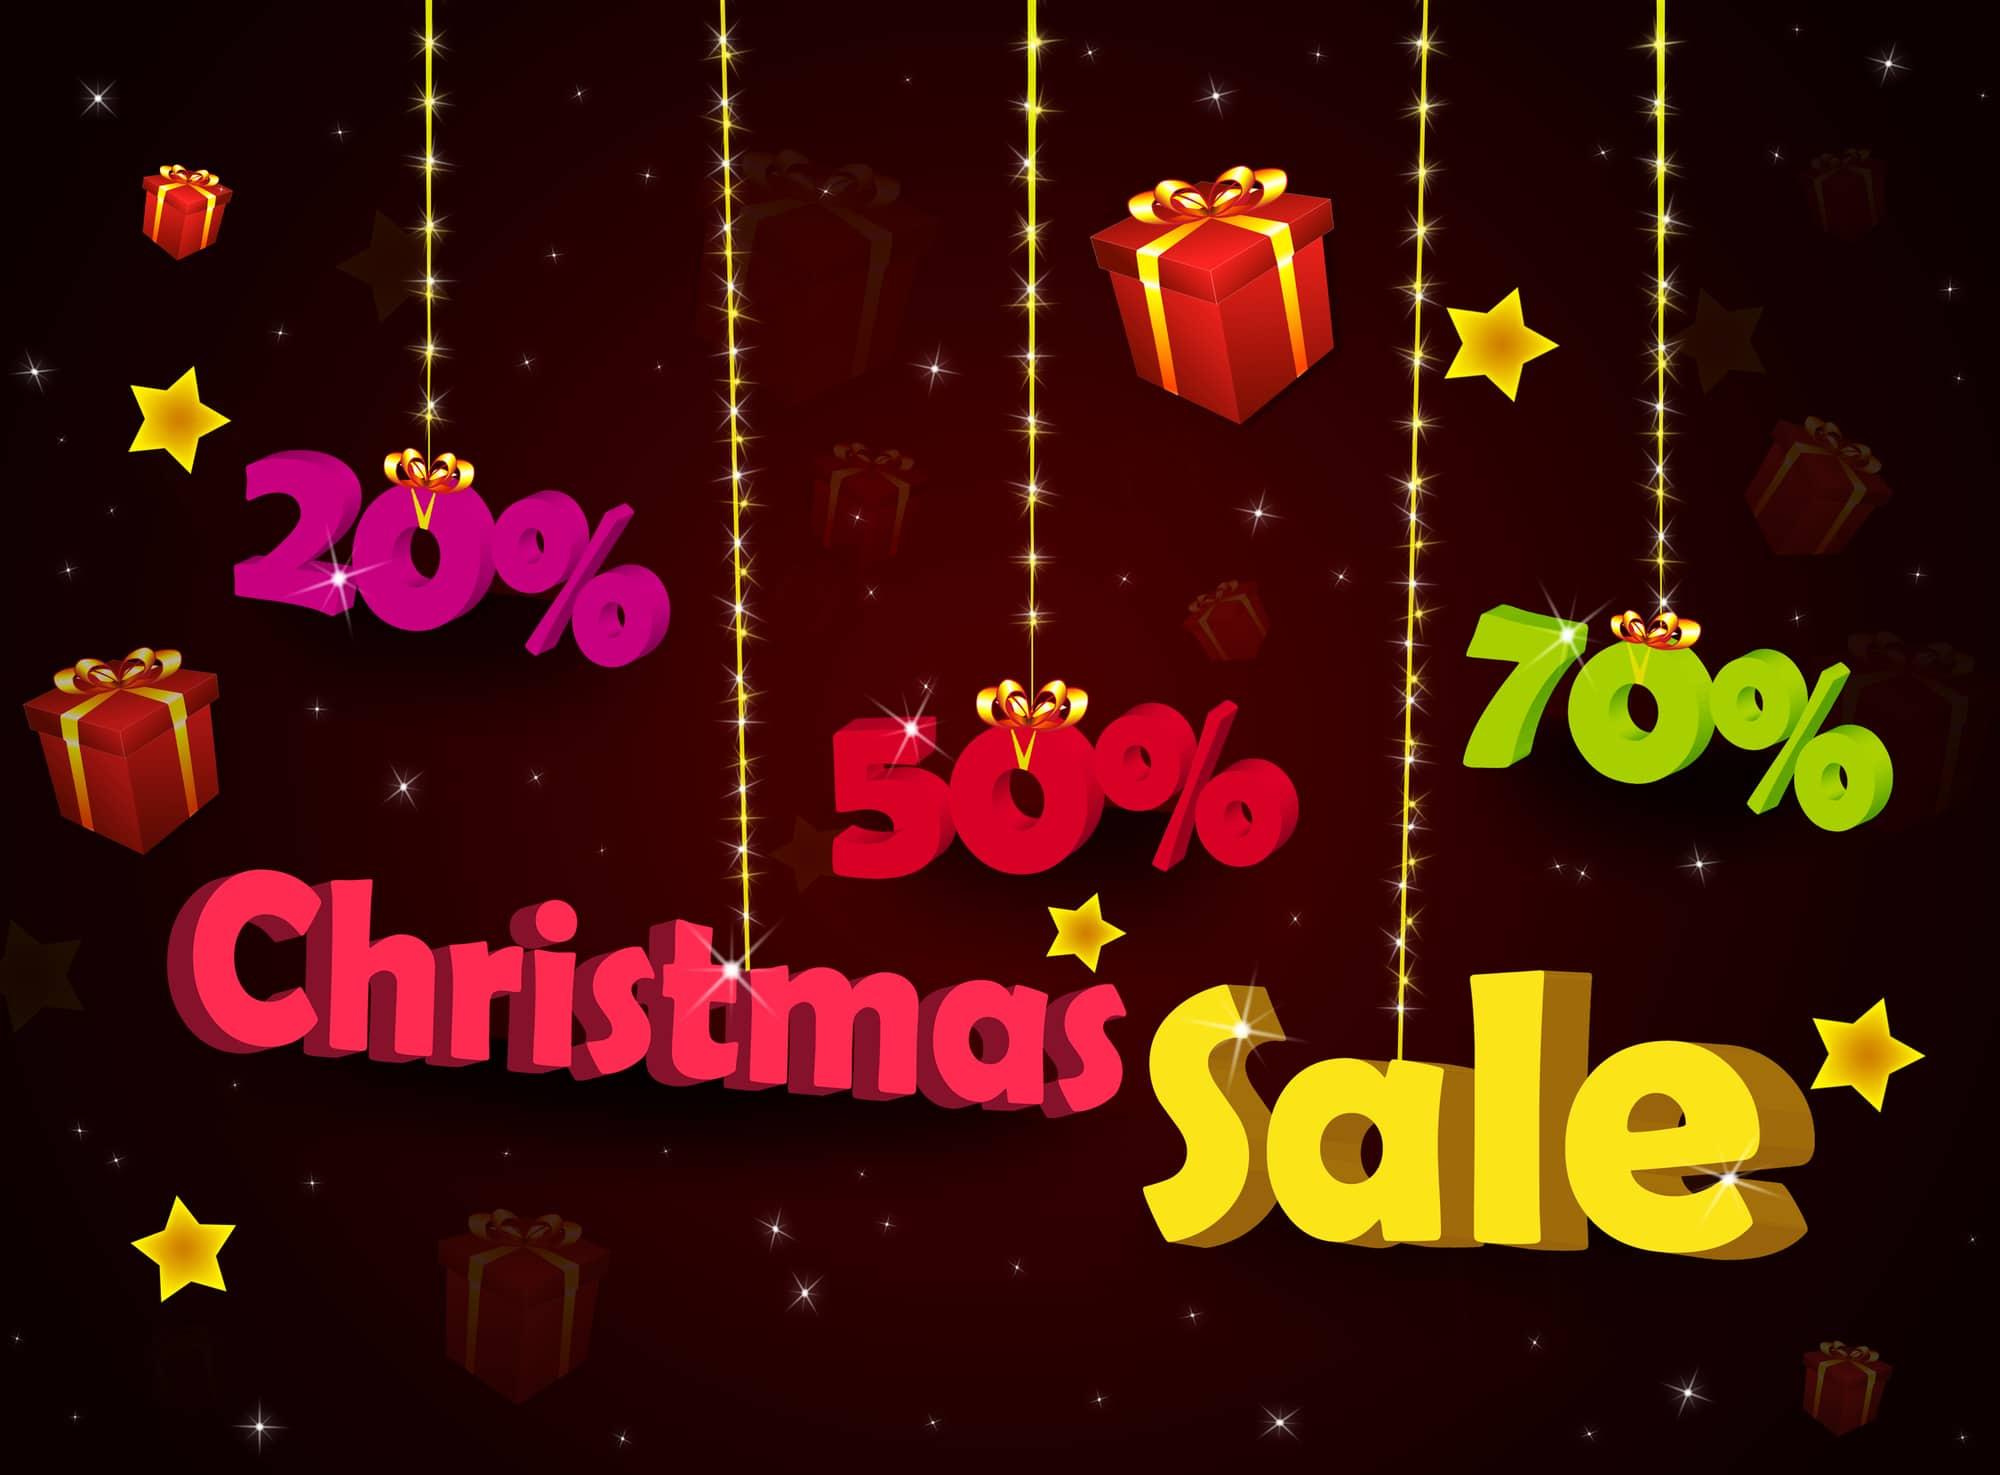 Christmas mattress sale